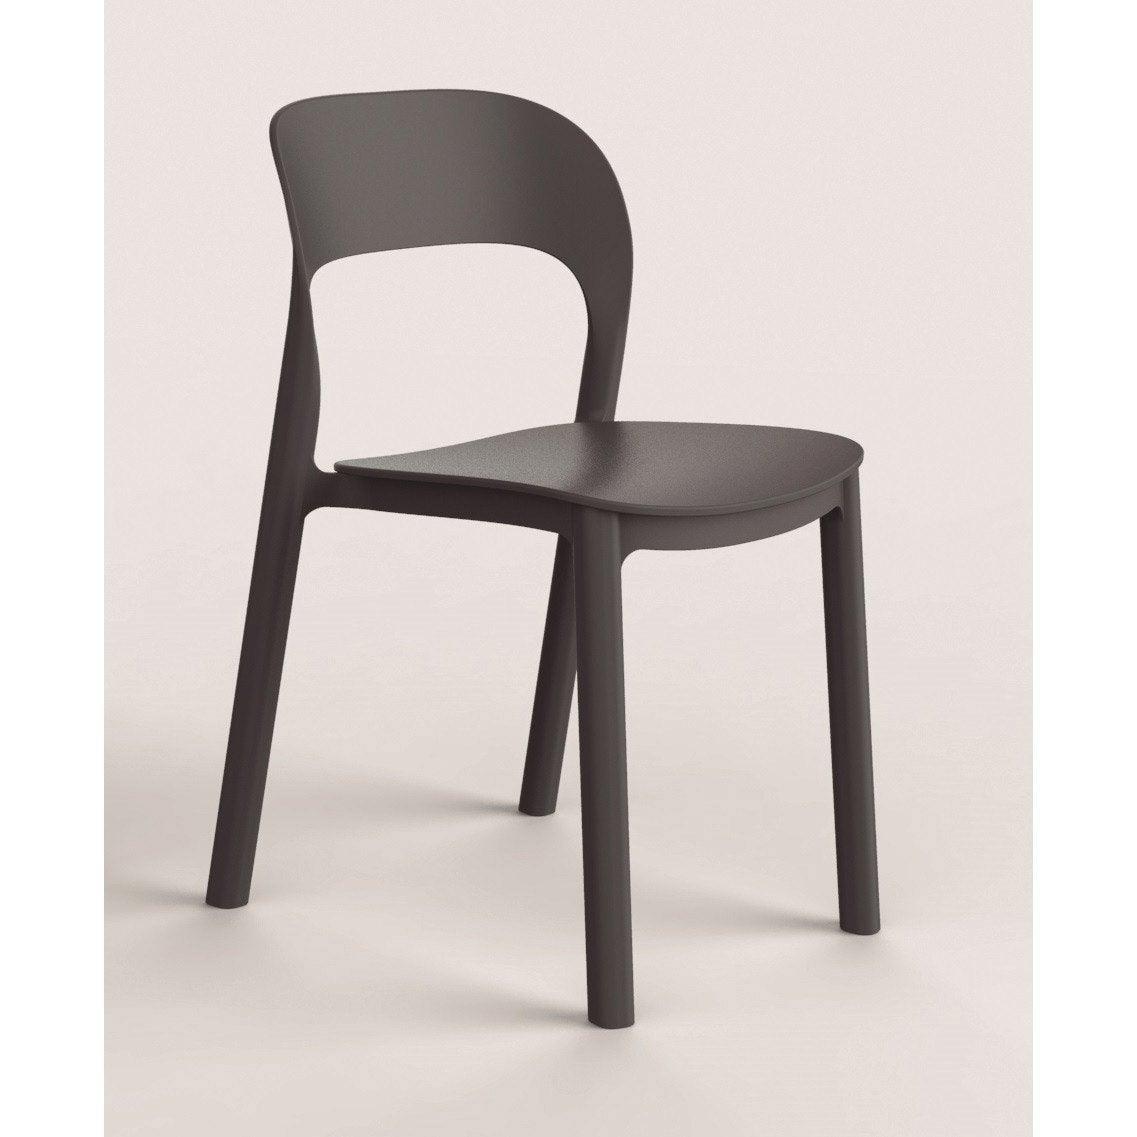 chaise de jardin en r sine inject e ona gris leroy merlin. Black Bedroom Furniture Sets. Home Design Ideas